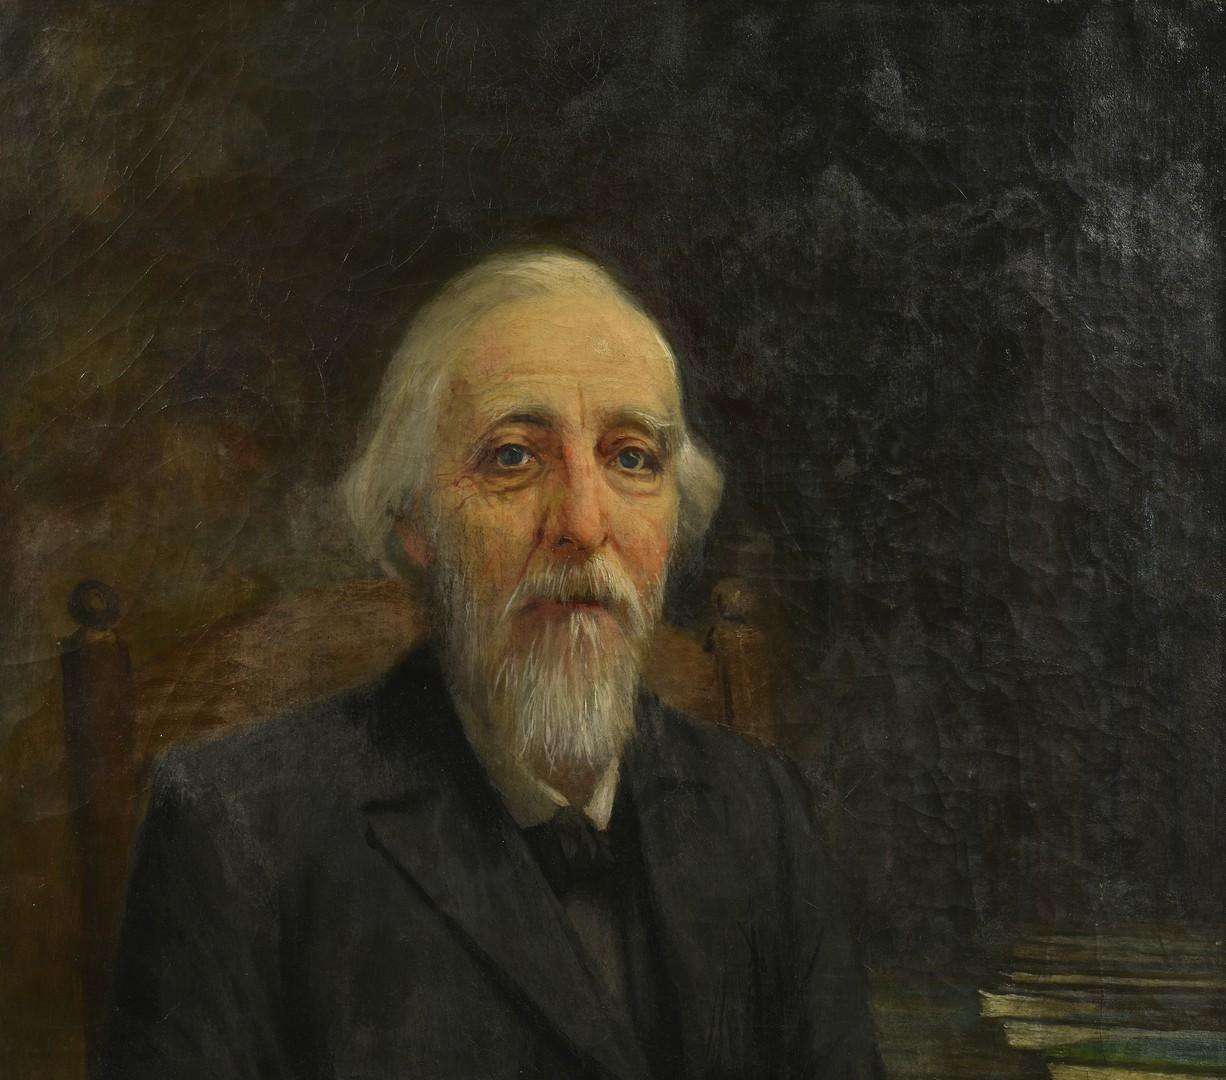 Lot 214: Older Gentleman Portrait, Attr. Lloyd Branson